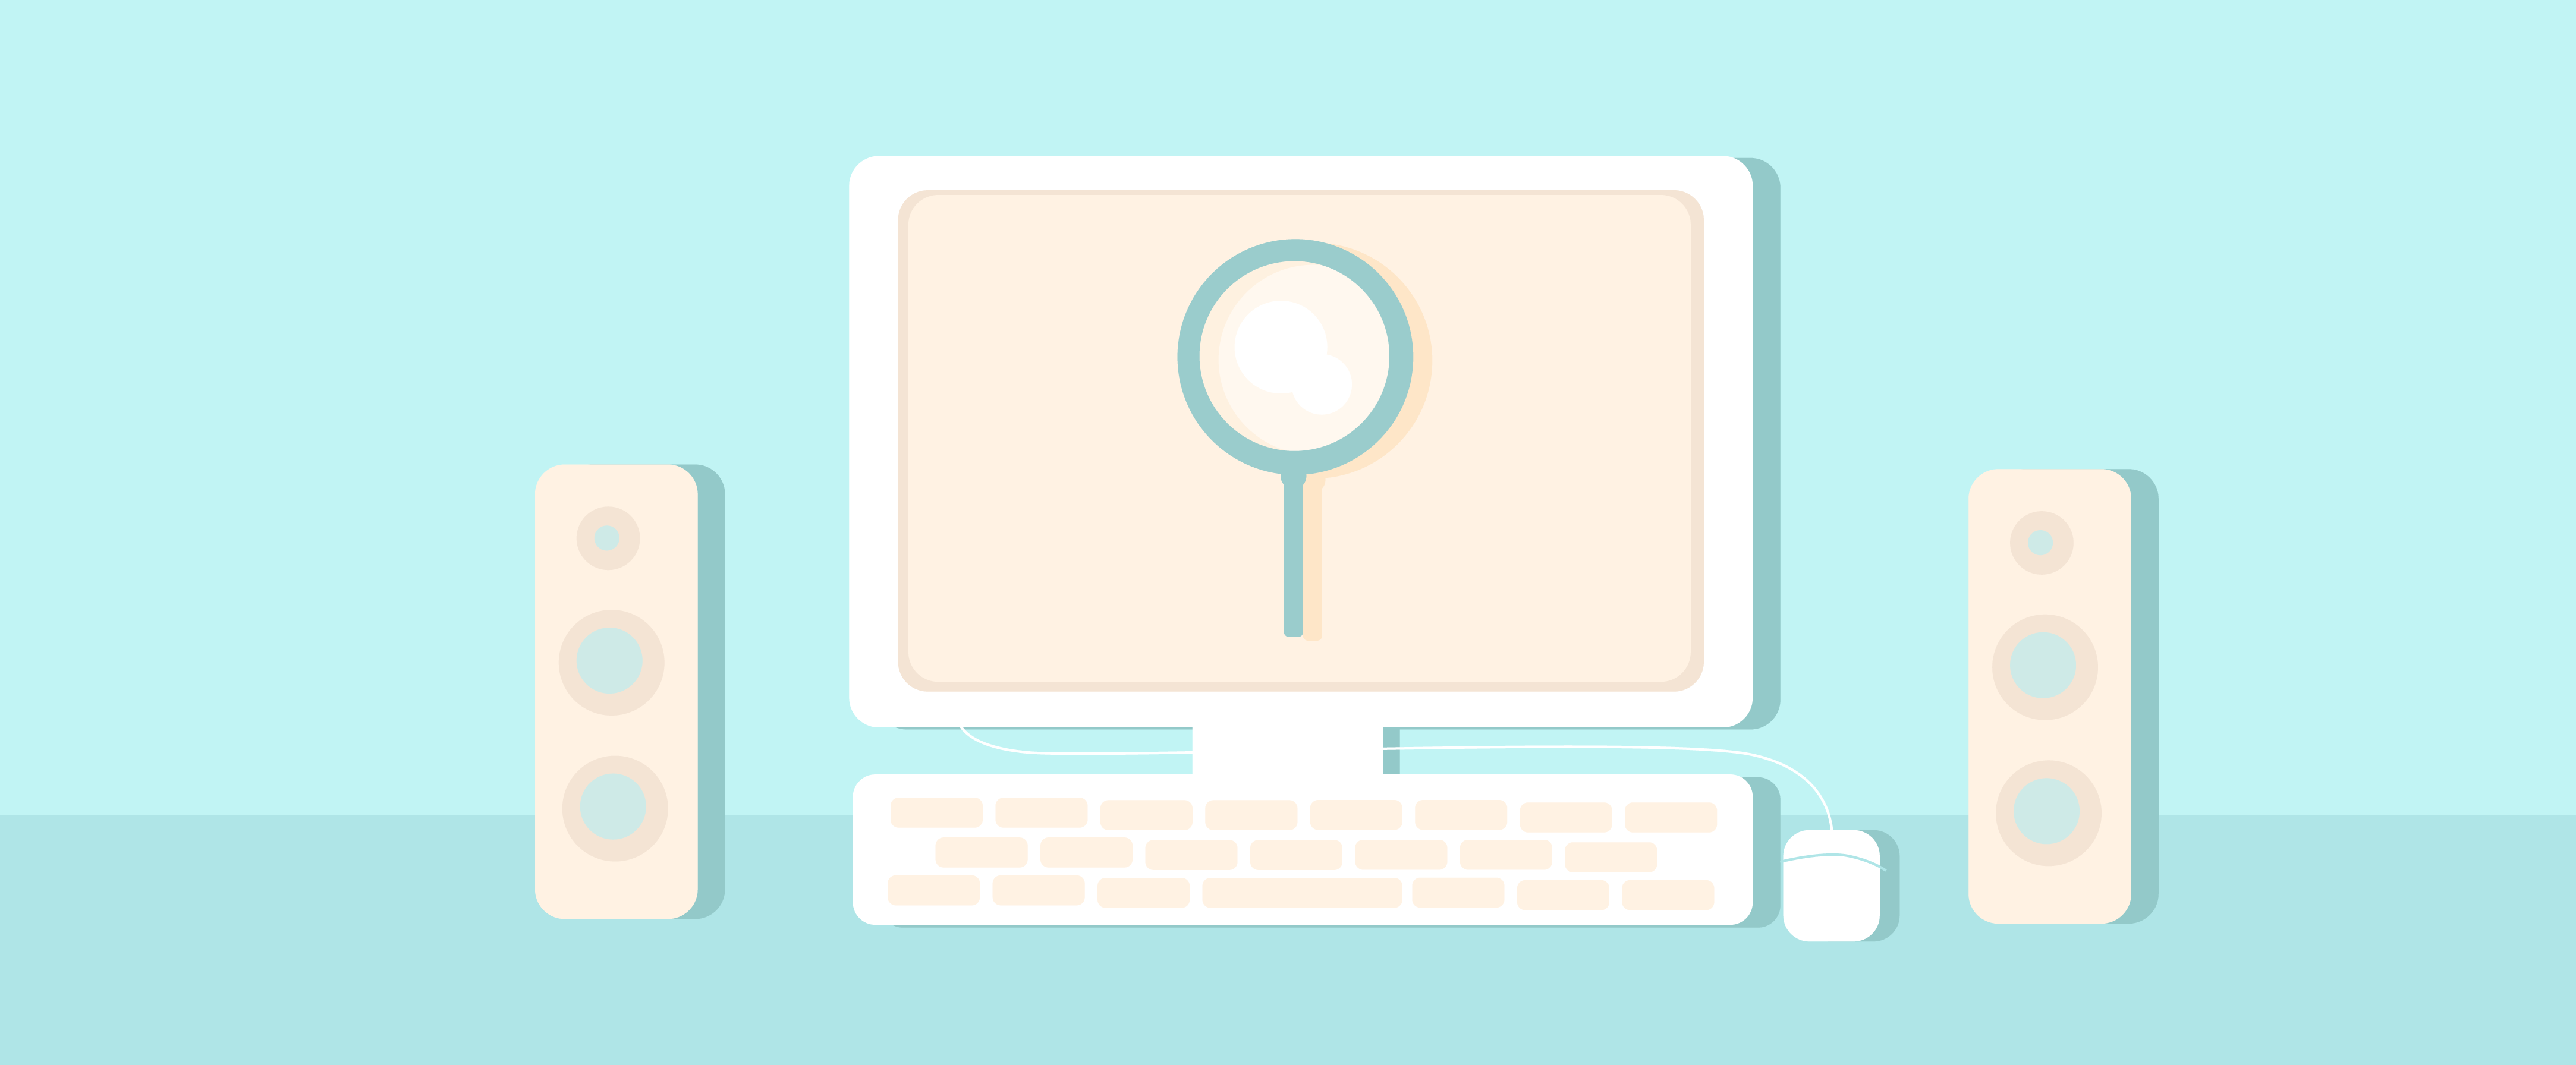 Web Analytics Tools: Analytical Tools Other Than Google Analytics